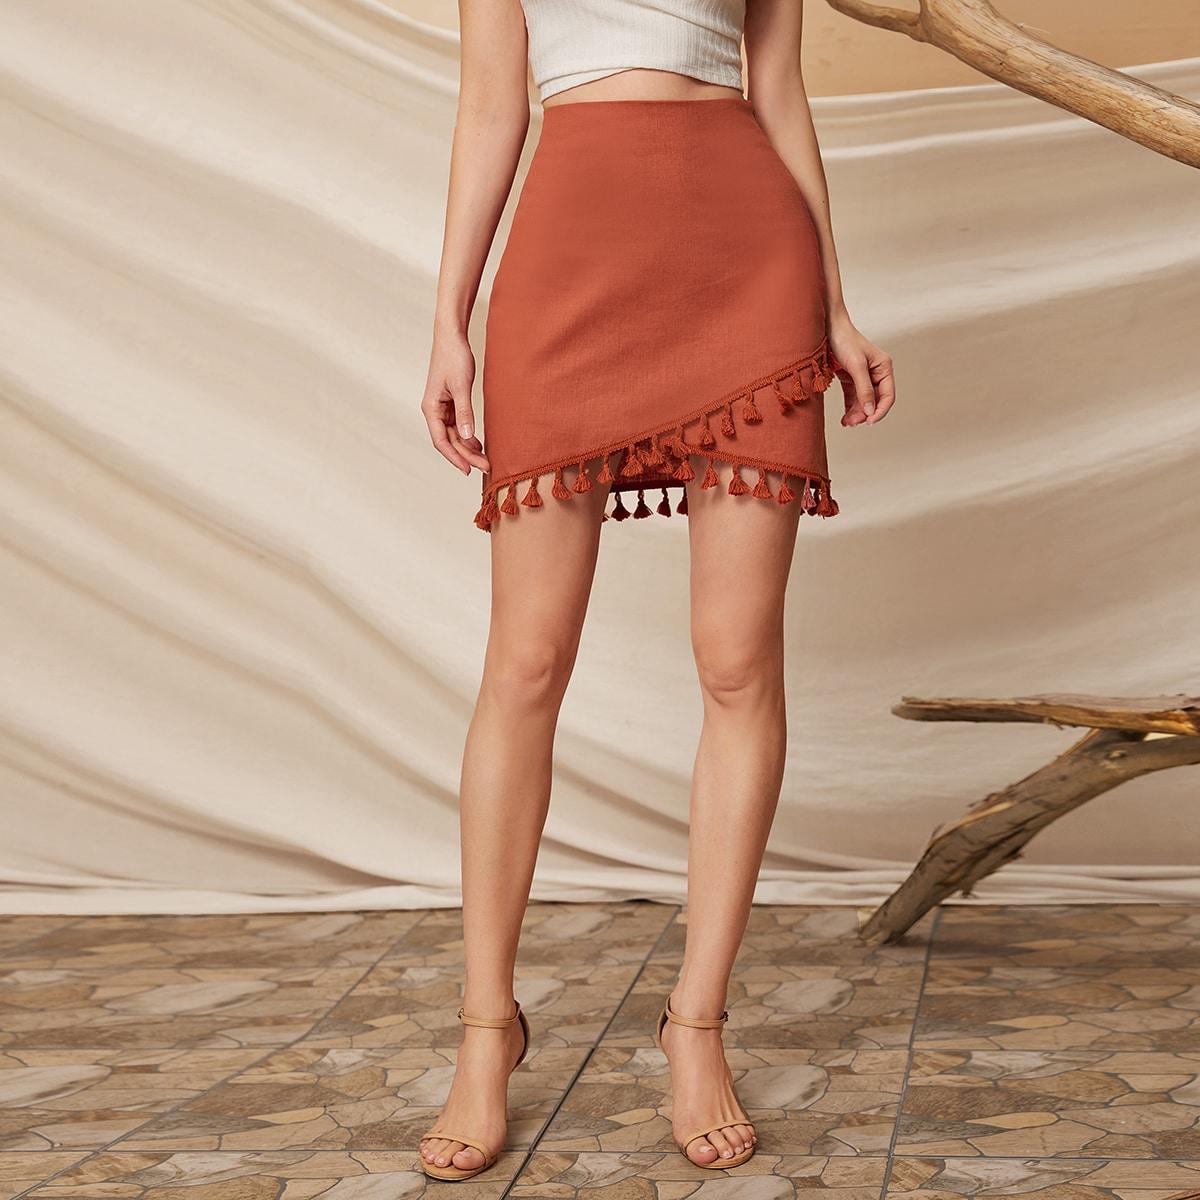 SHEIN / Falda mini con diseño de fleco bajo con tulipán